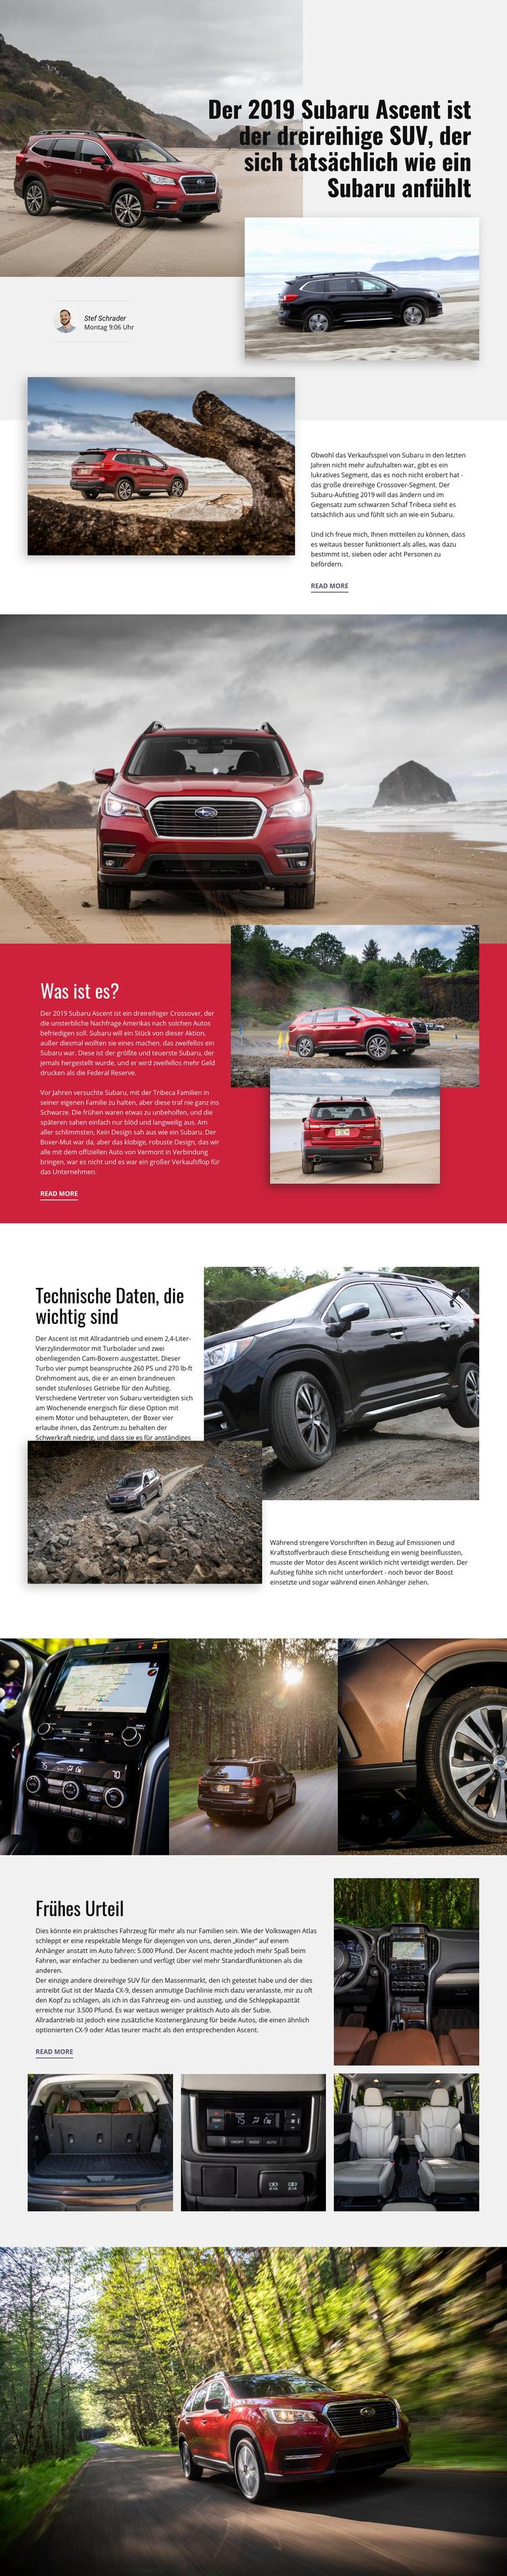 Subaru Website-Vorlage